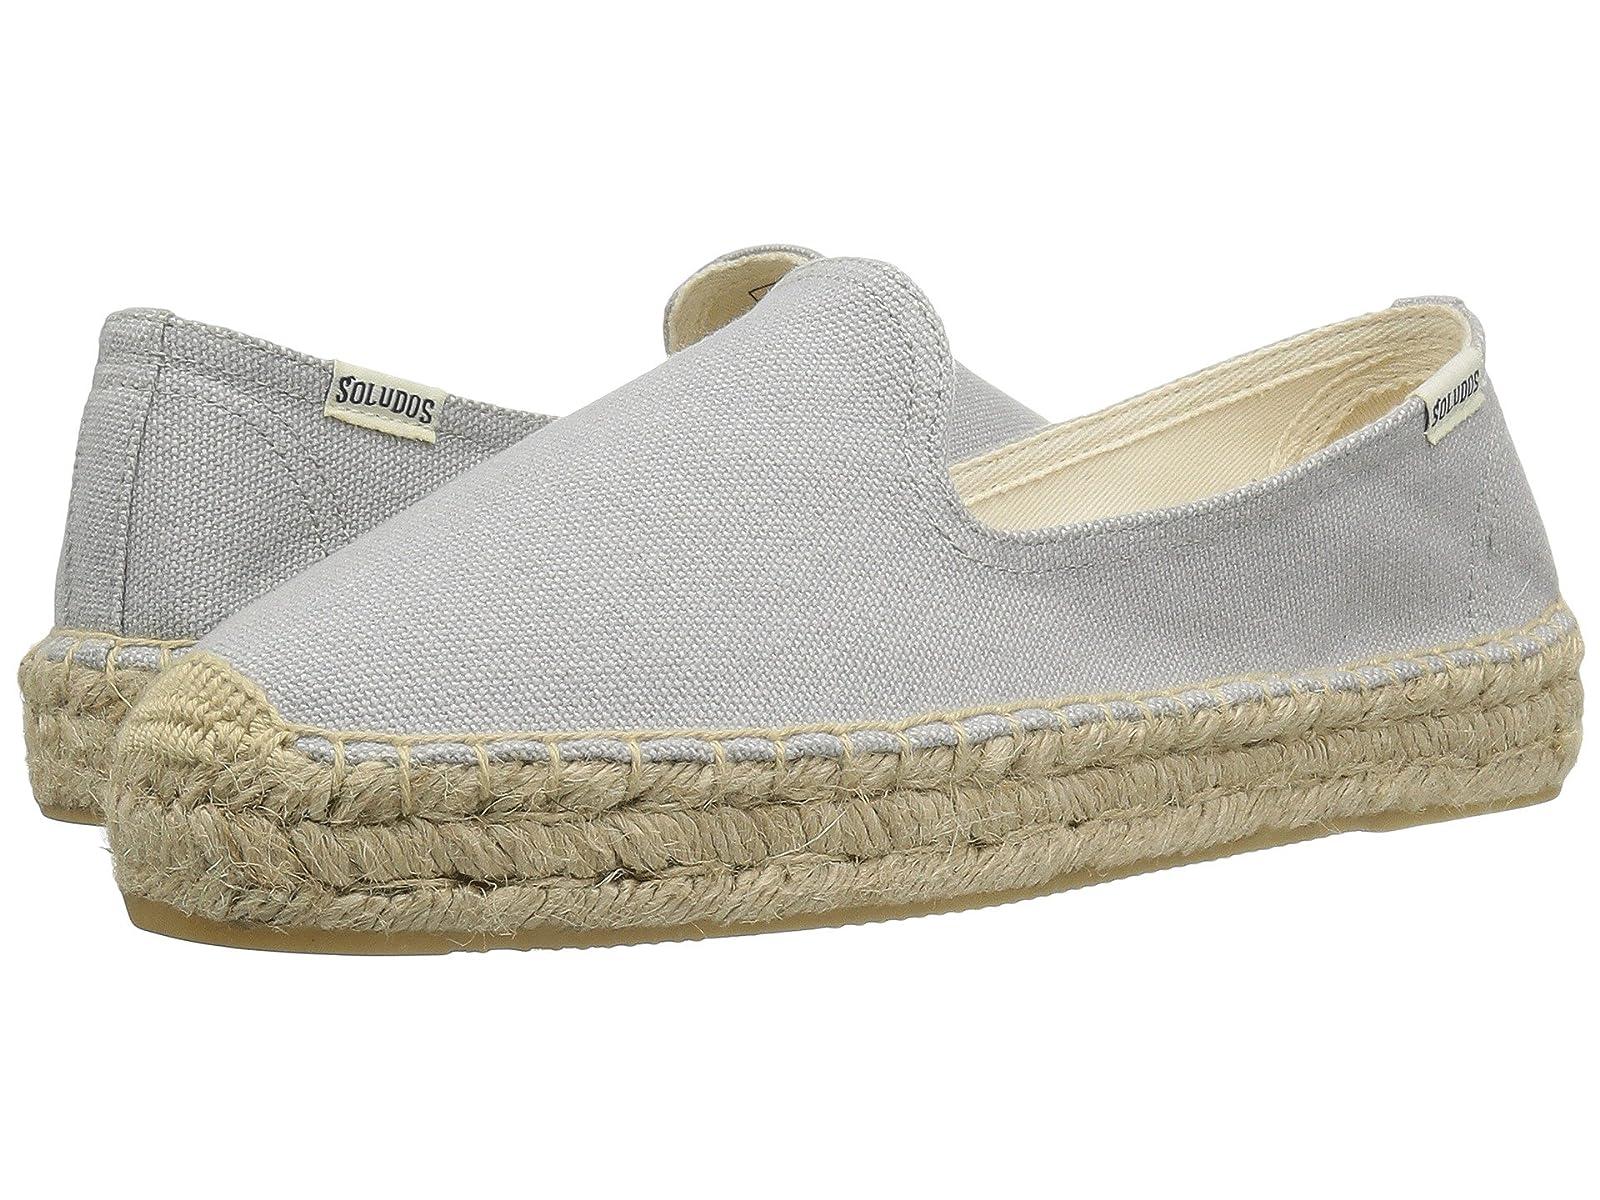 Soludos Canvas Platform Smoking SlipperCheap and distinctive eye-catching shoes